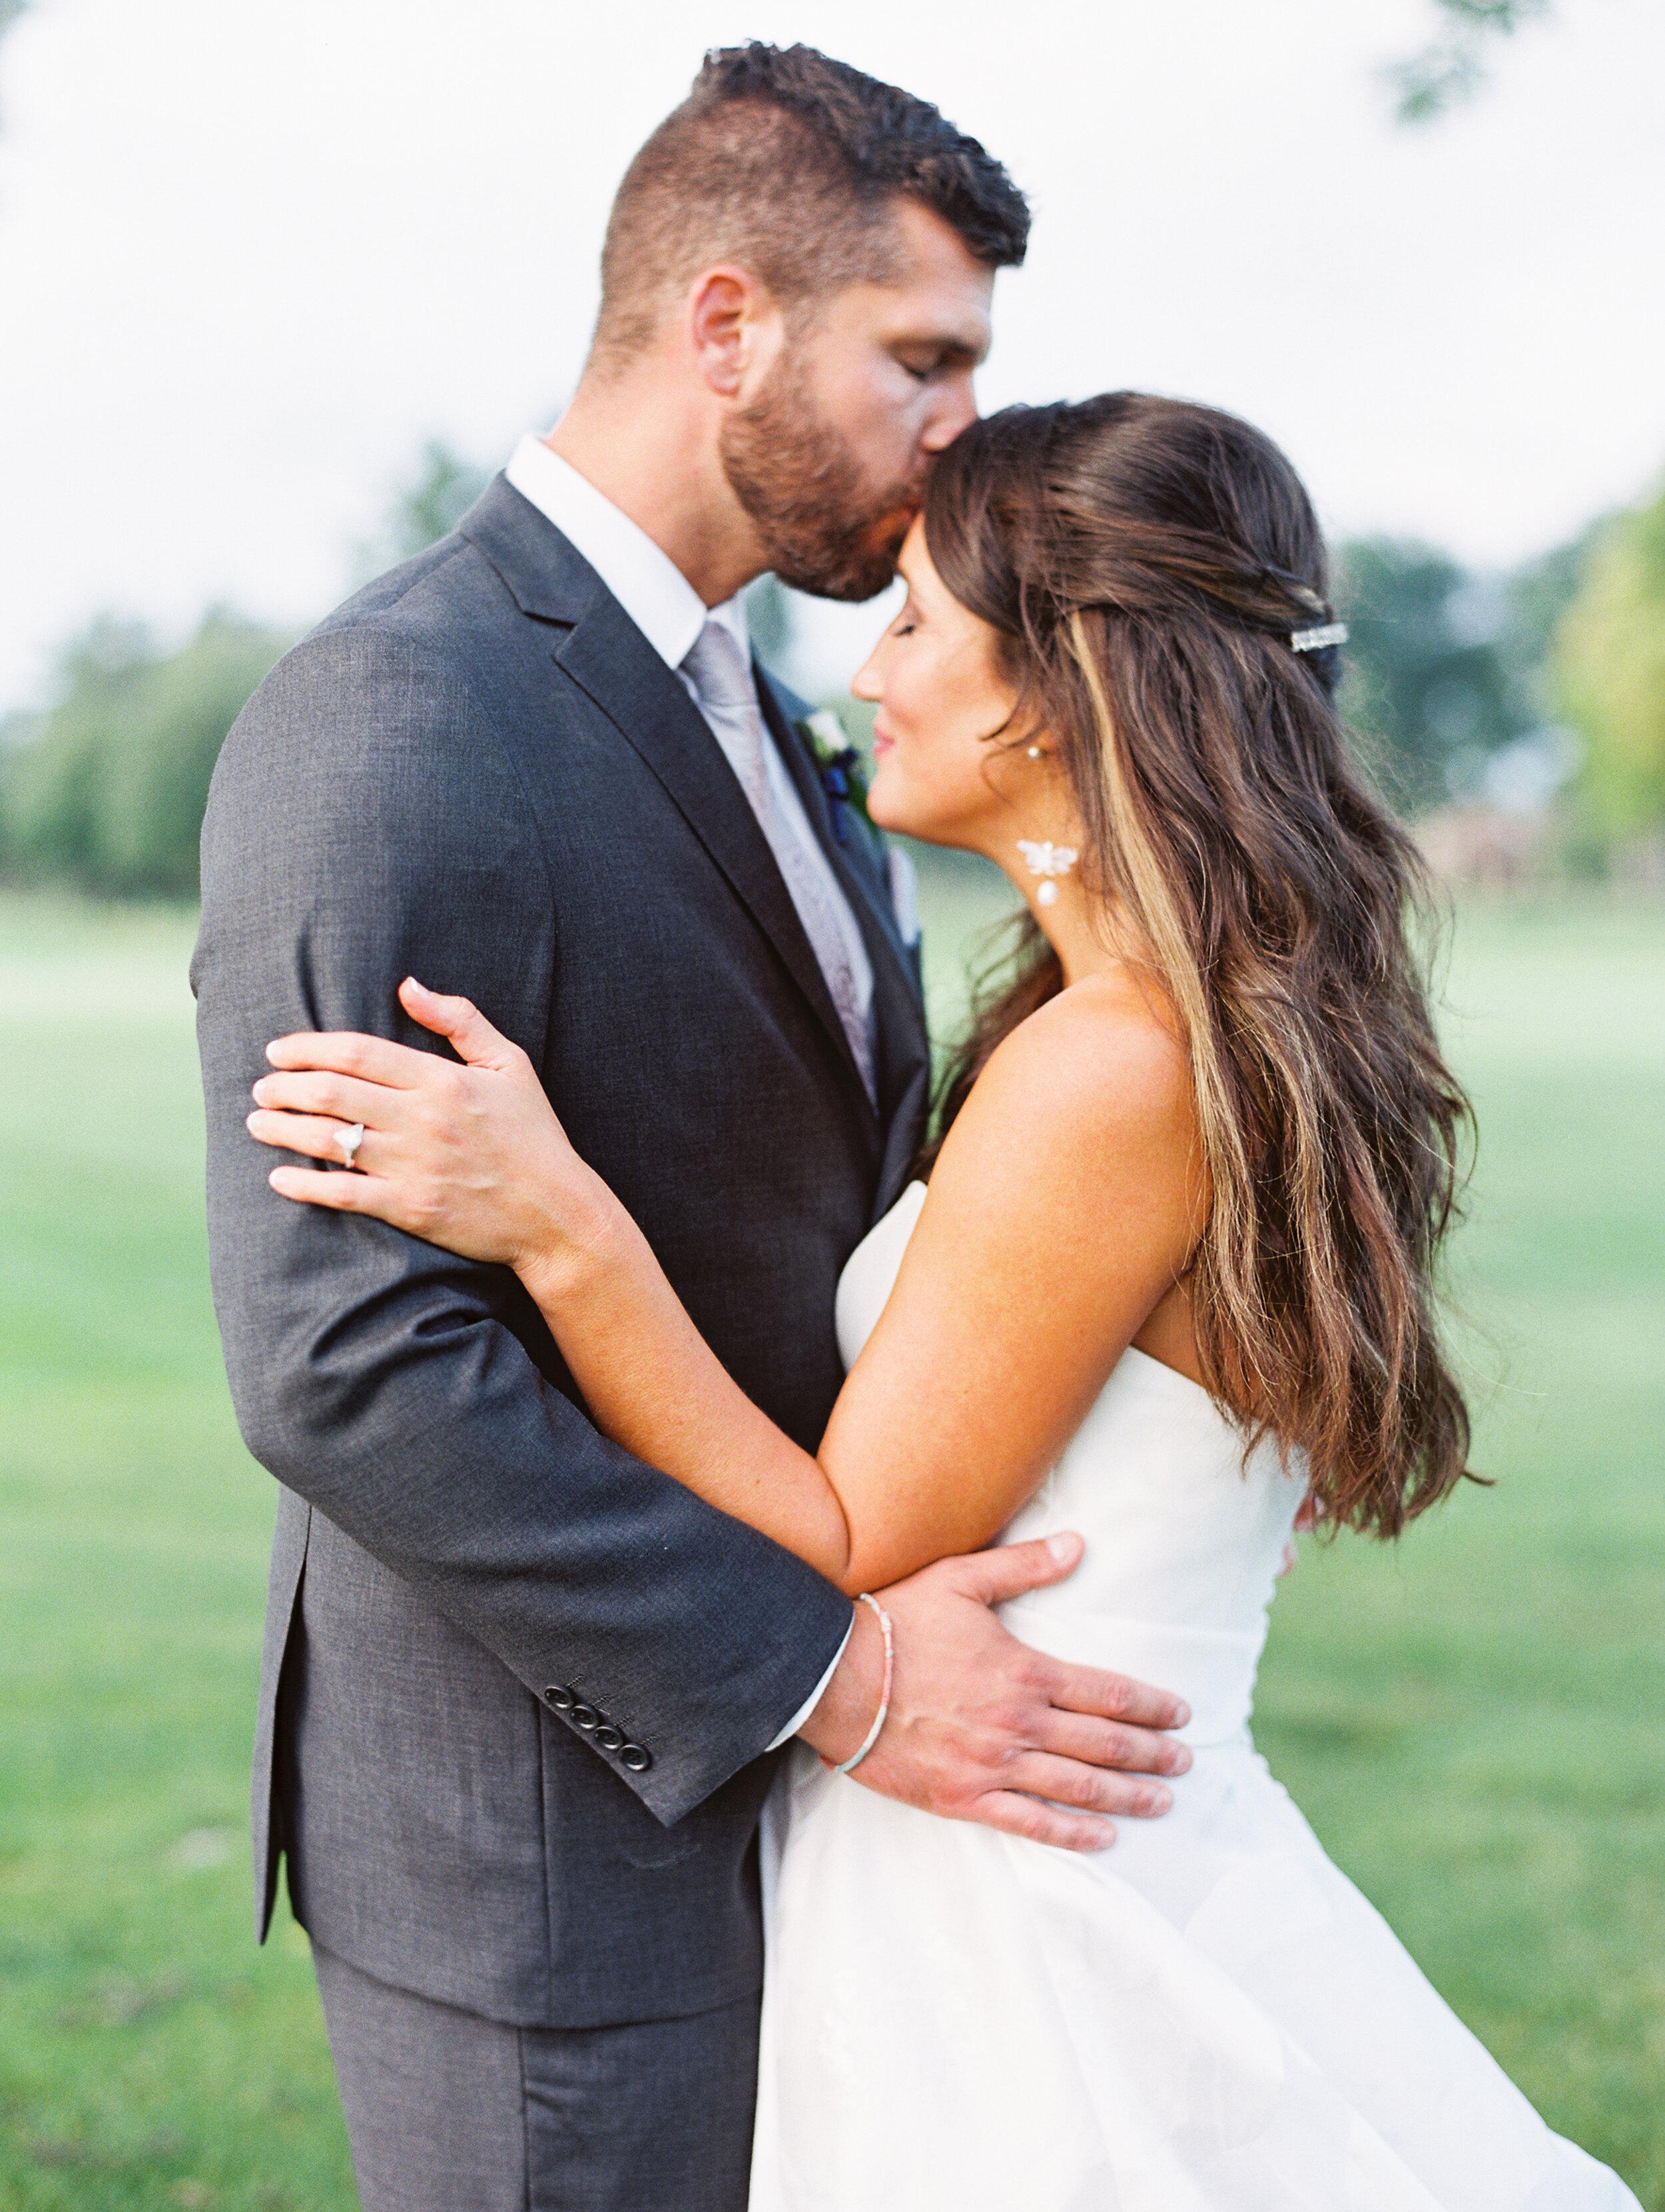 Kuiper+Wedding+Reception+Bridal+Party-149.jpg